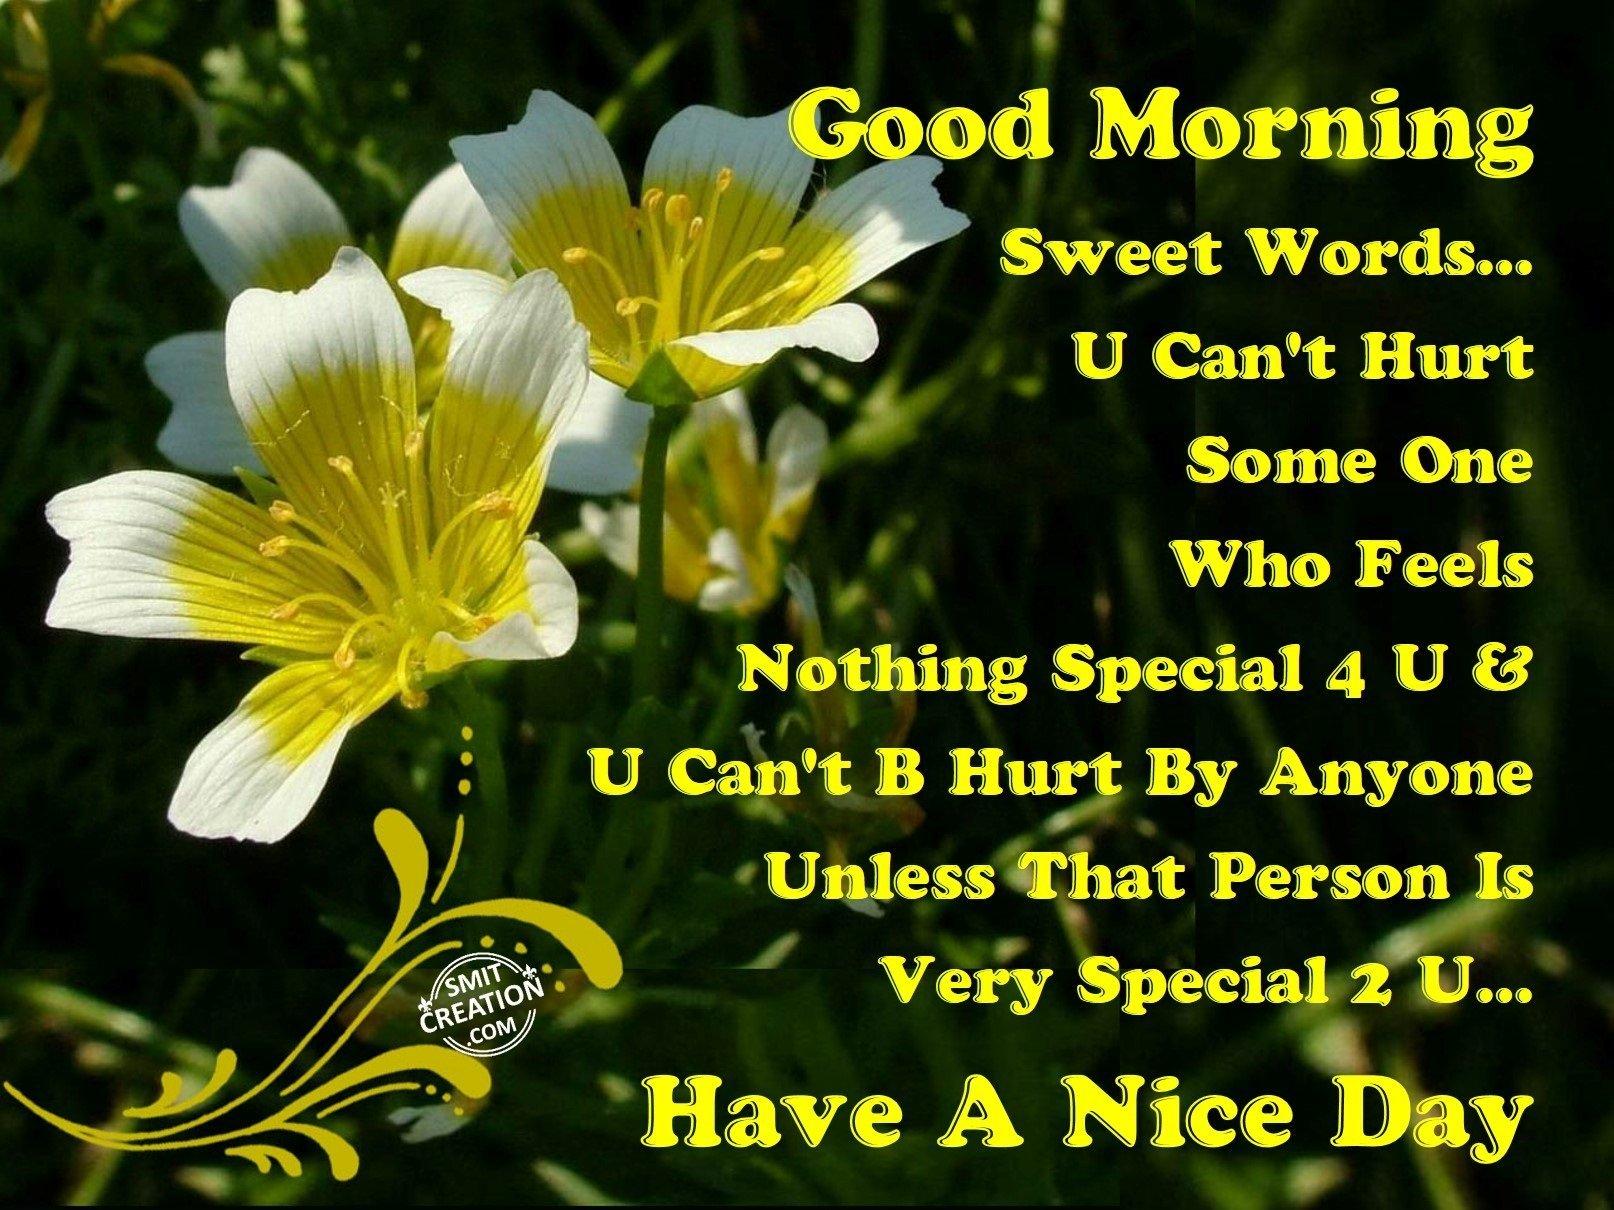 Good Morning – Have A Nice Day - SmitCreation.com